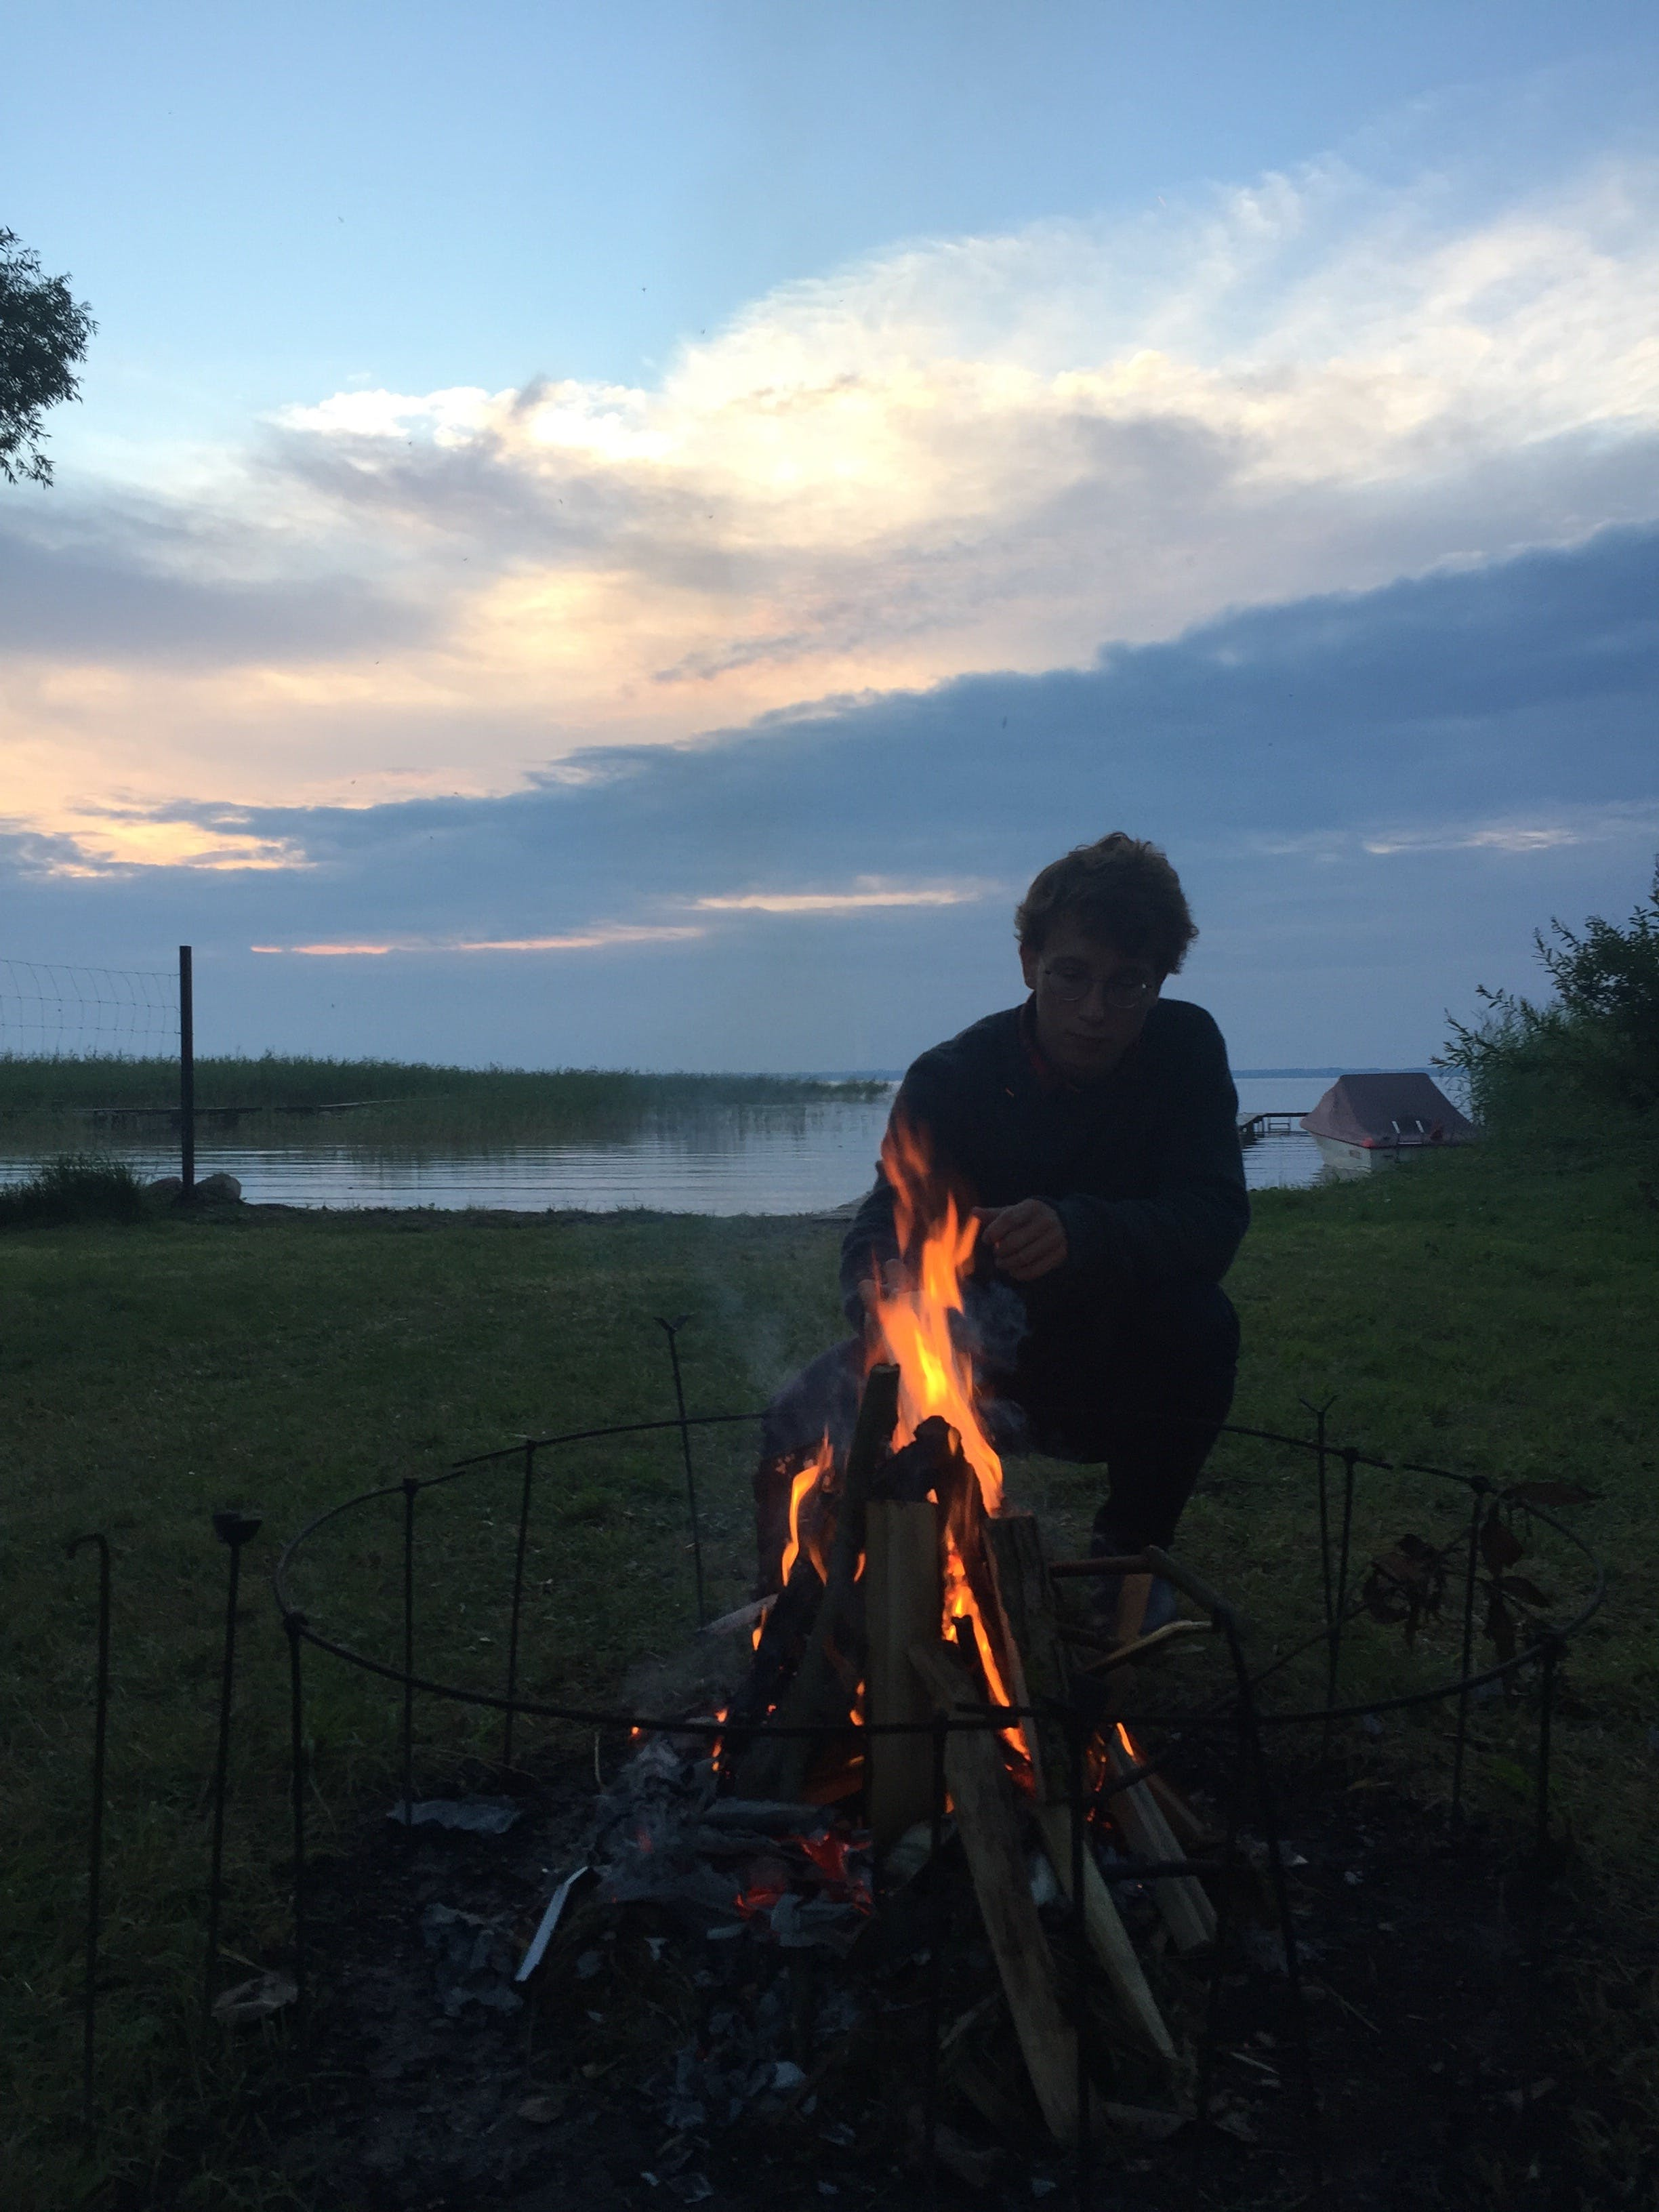 Free stock photo of Åšniardwy, bonfire, campfire, mazury